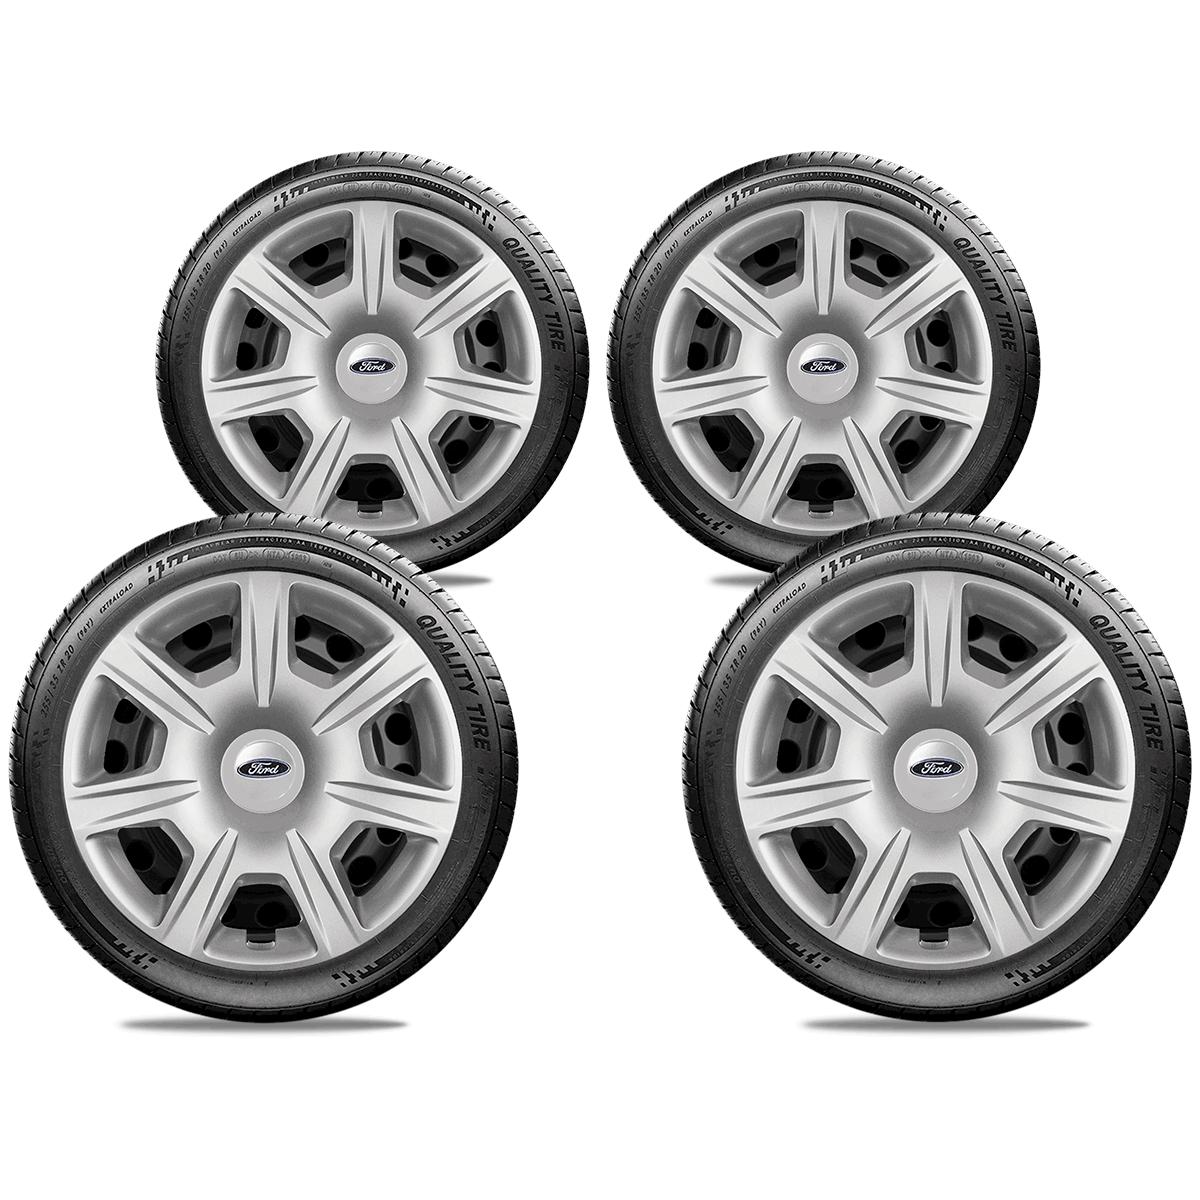 Calota Jogo 4Pçs Ford Novo Ká Fiesta Focus Aro 15 G876J